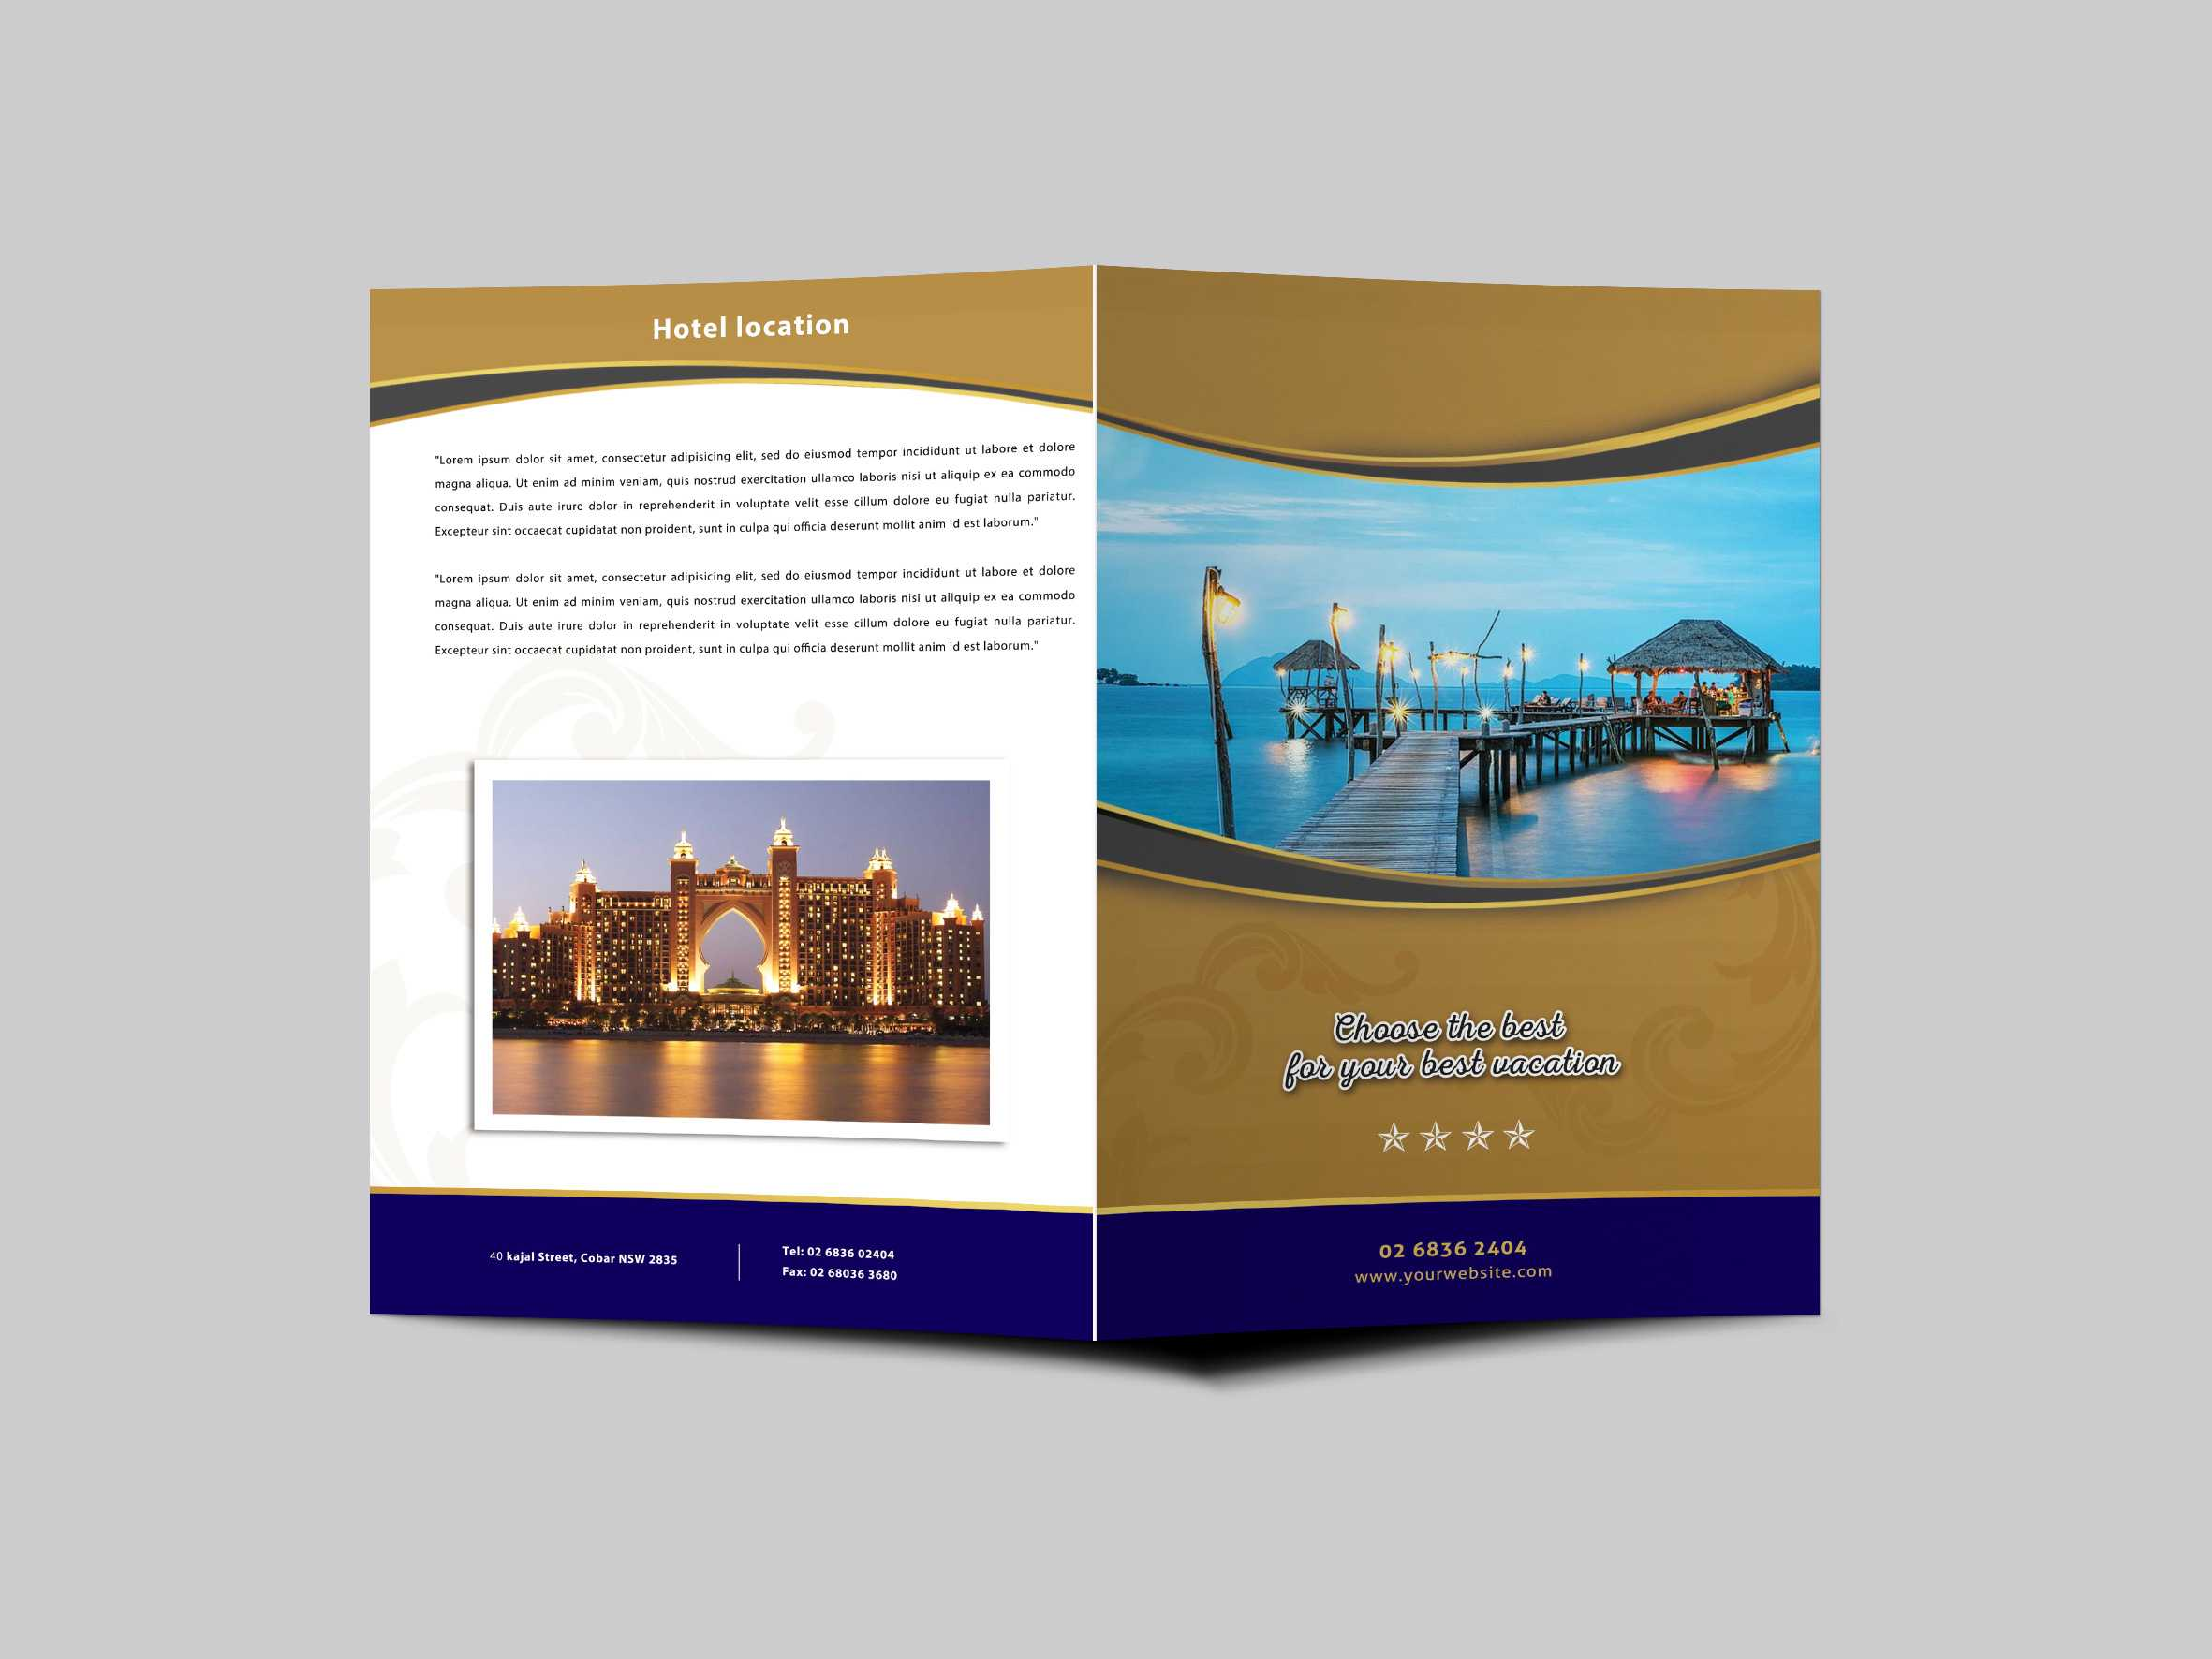 Hotel Resort Bi Fold Brochure Design Templatearun Kumar Regarding Hotel Brochure Design Templates